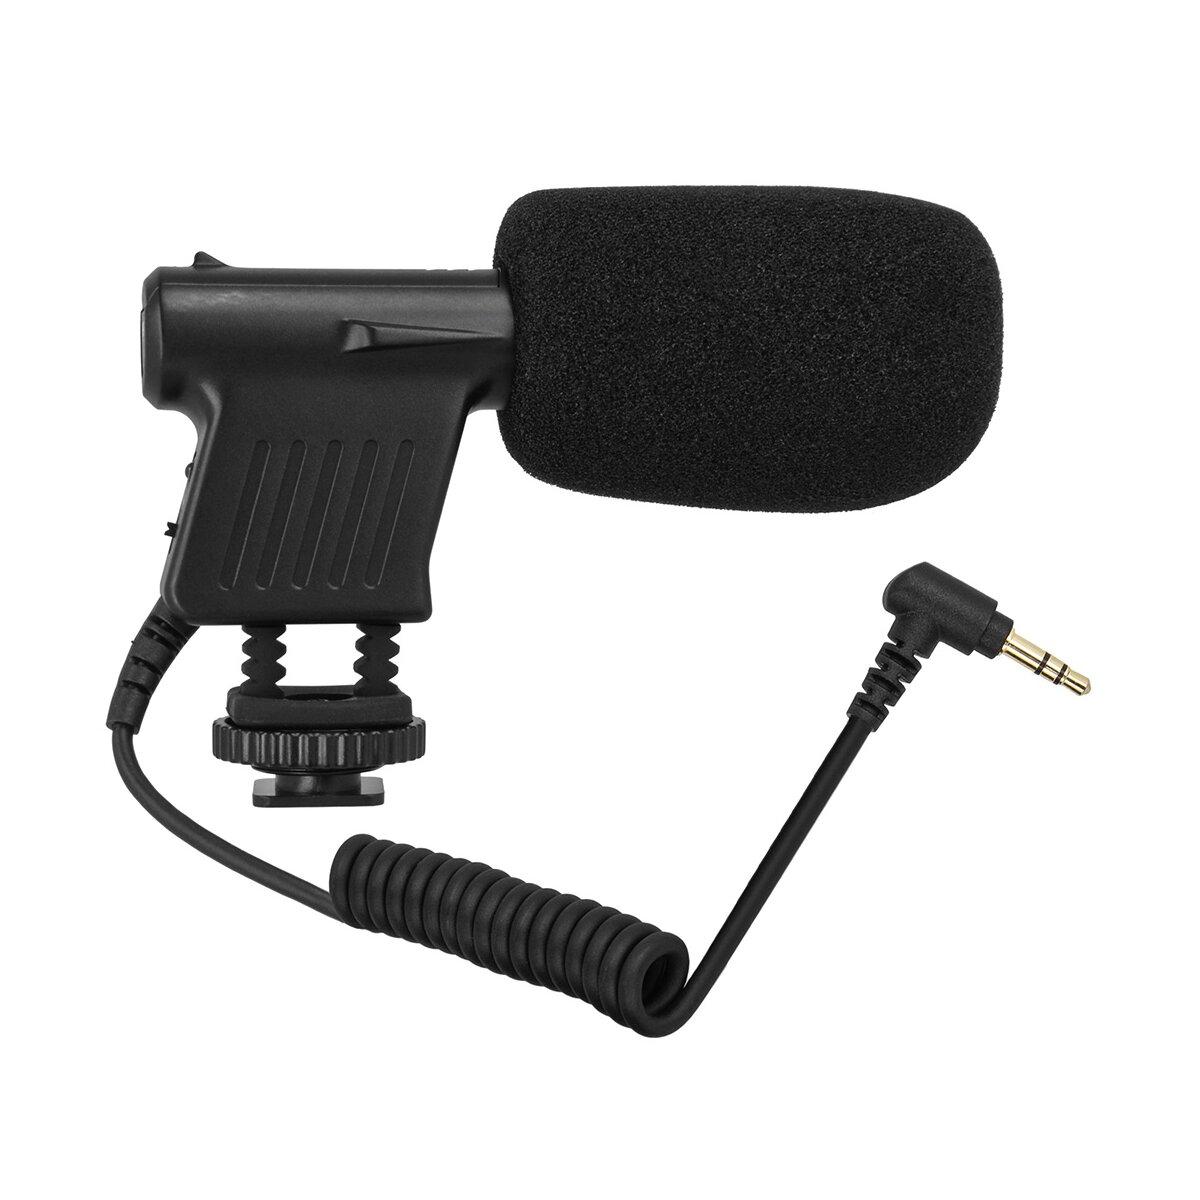 Boya BY-VM01 Richtmikrofon Kondensatormikrofon   für DSLRs DSLMs Camcorder   Supernieren-Charakteristik QUALITATIVE Aufnahmen   PERFEKT geeignet für Tonaufnahmen